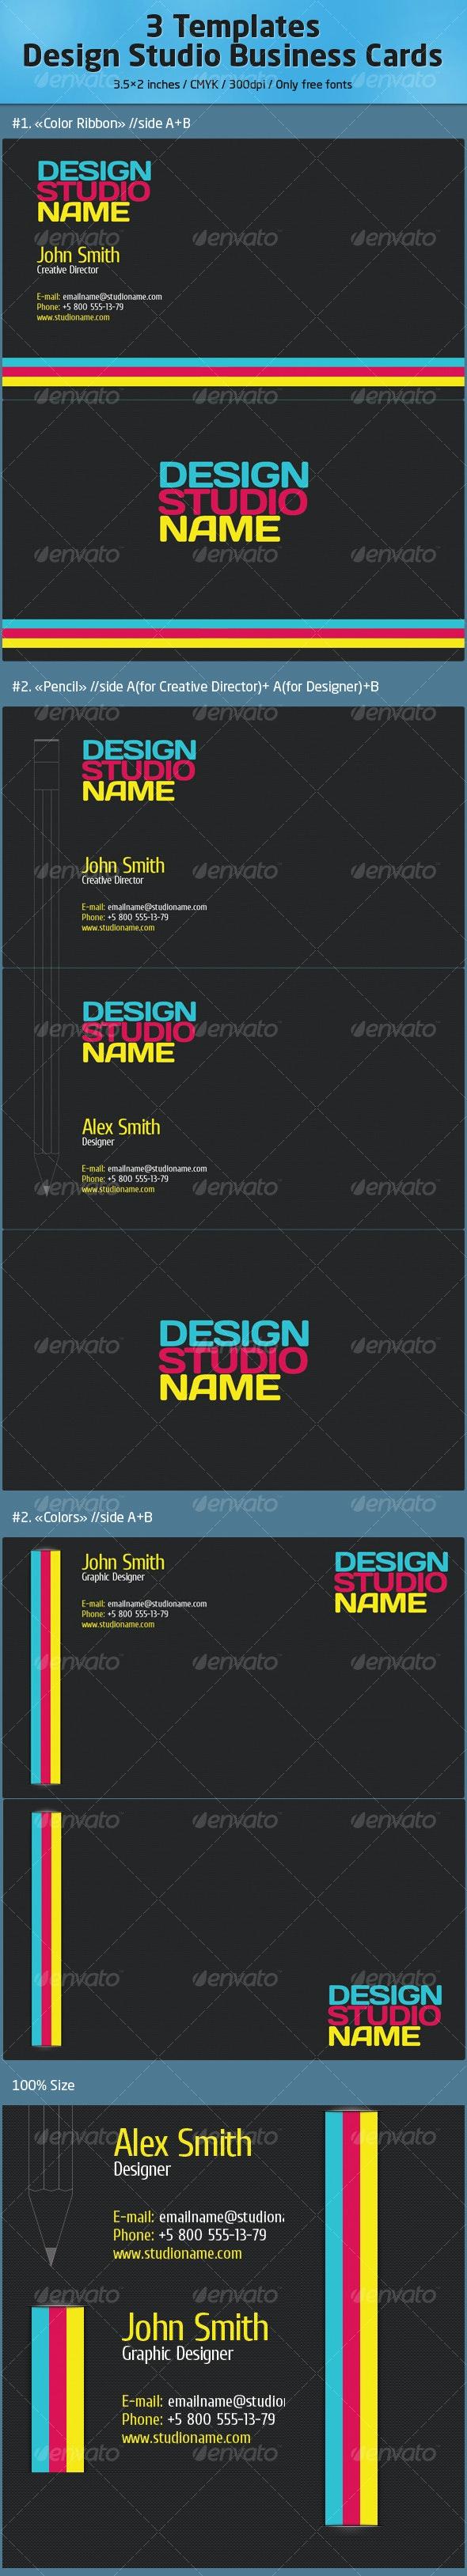 Design Studio Business Cards //Carbon - Corporate Business Cards